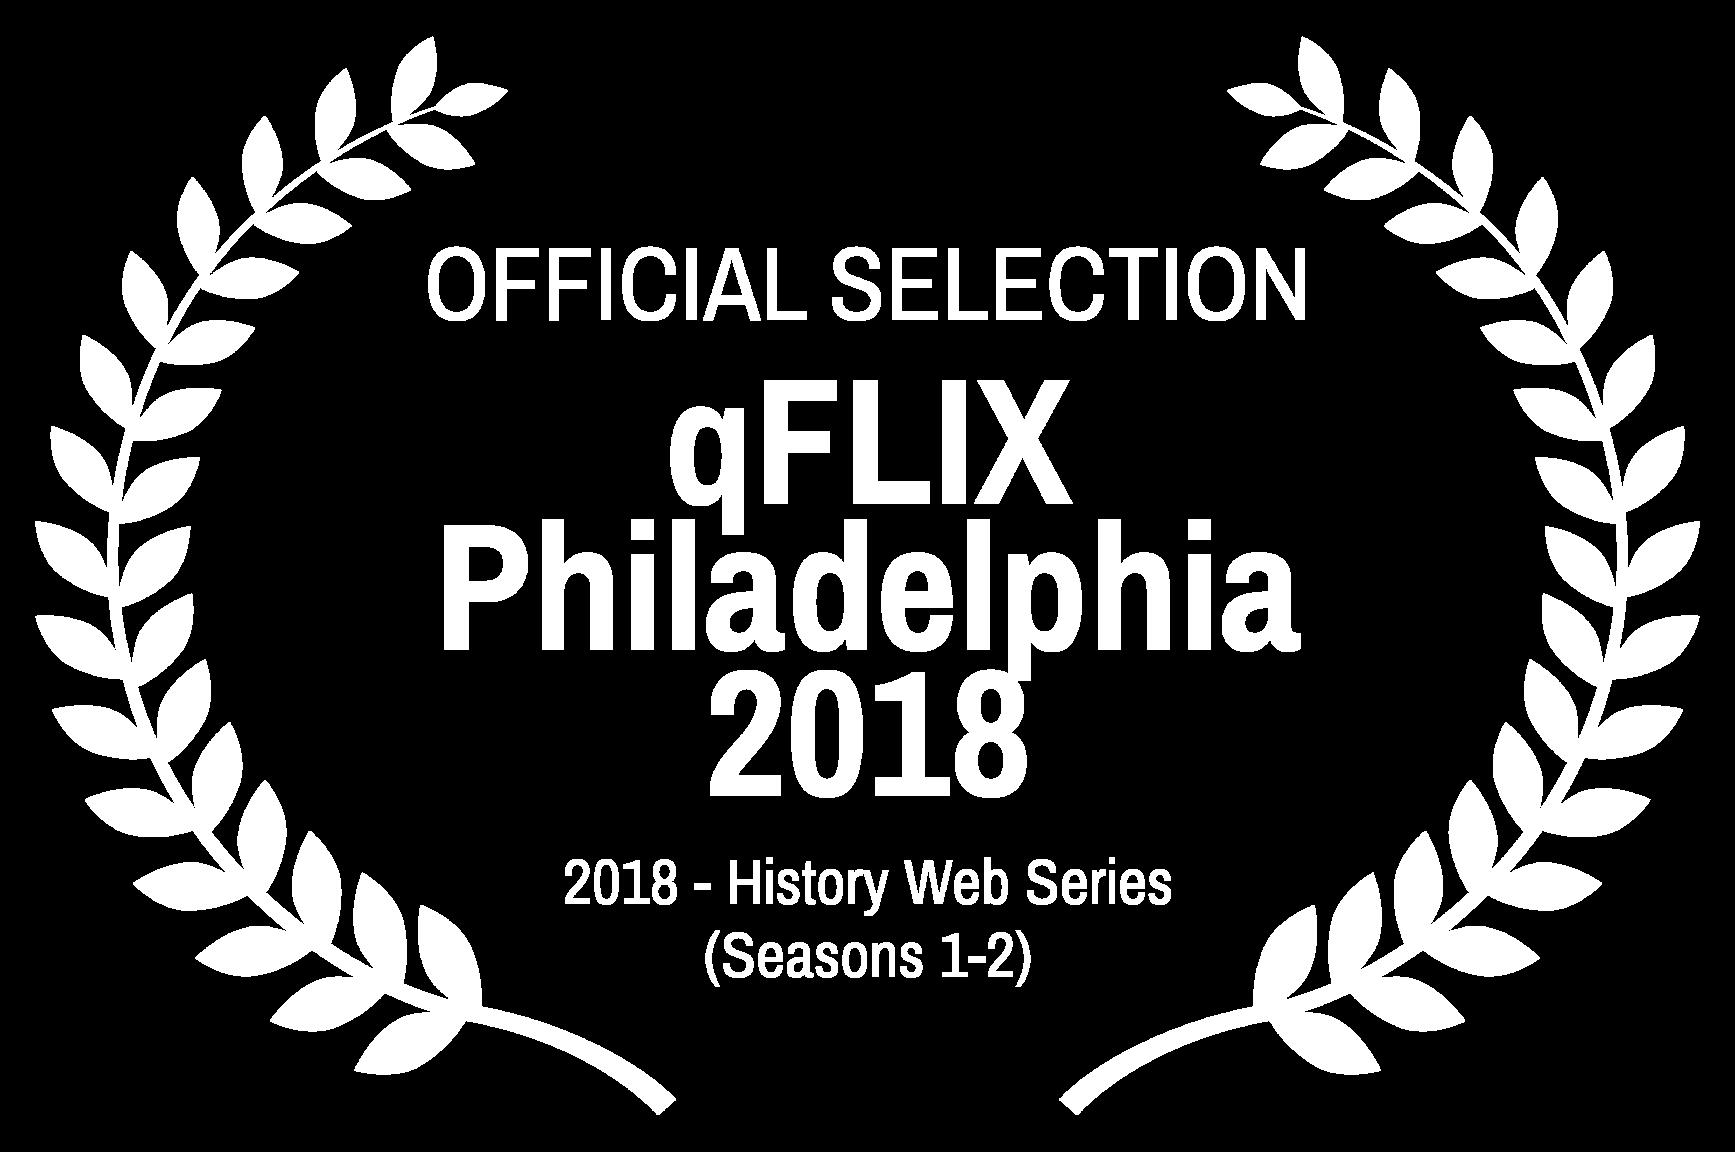 OFFICIAL SELECTION - qFLIX Philadelphia 2018 - 2018 - History Web Series Seasons 1-2.png